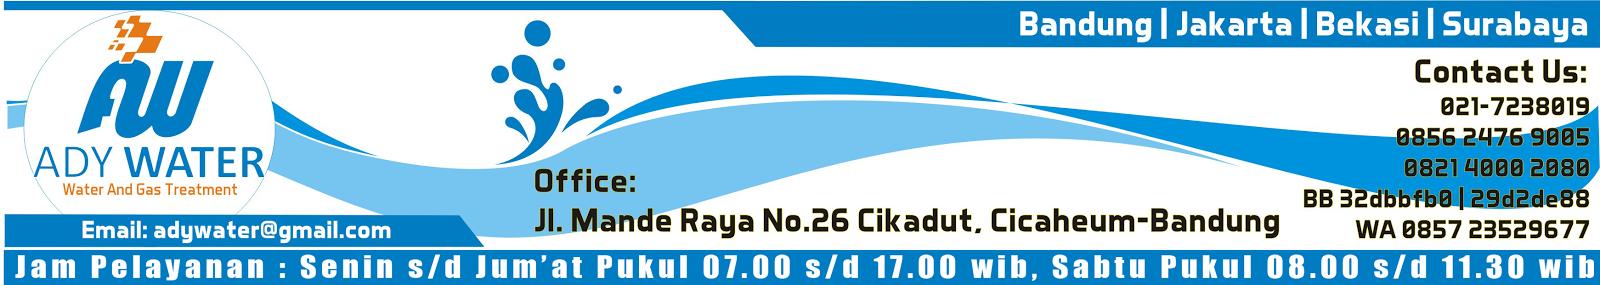 Jual Pasir Silika | Harga Pasir Silika | Membran RO | Jual Resin Kation Anion| Conductivity meter